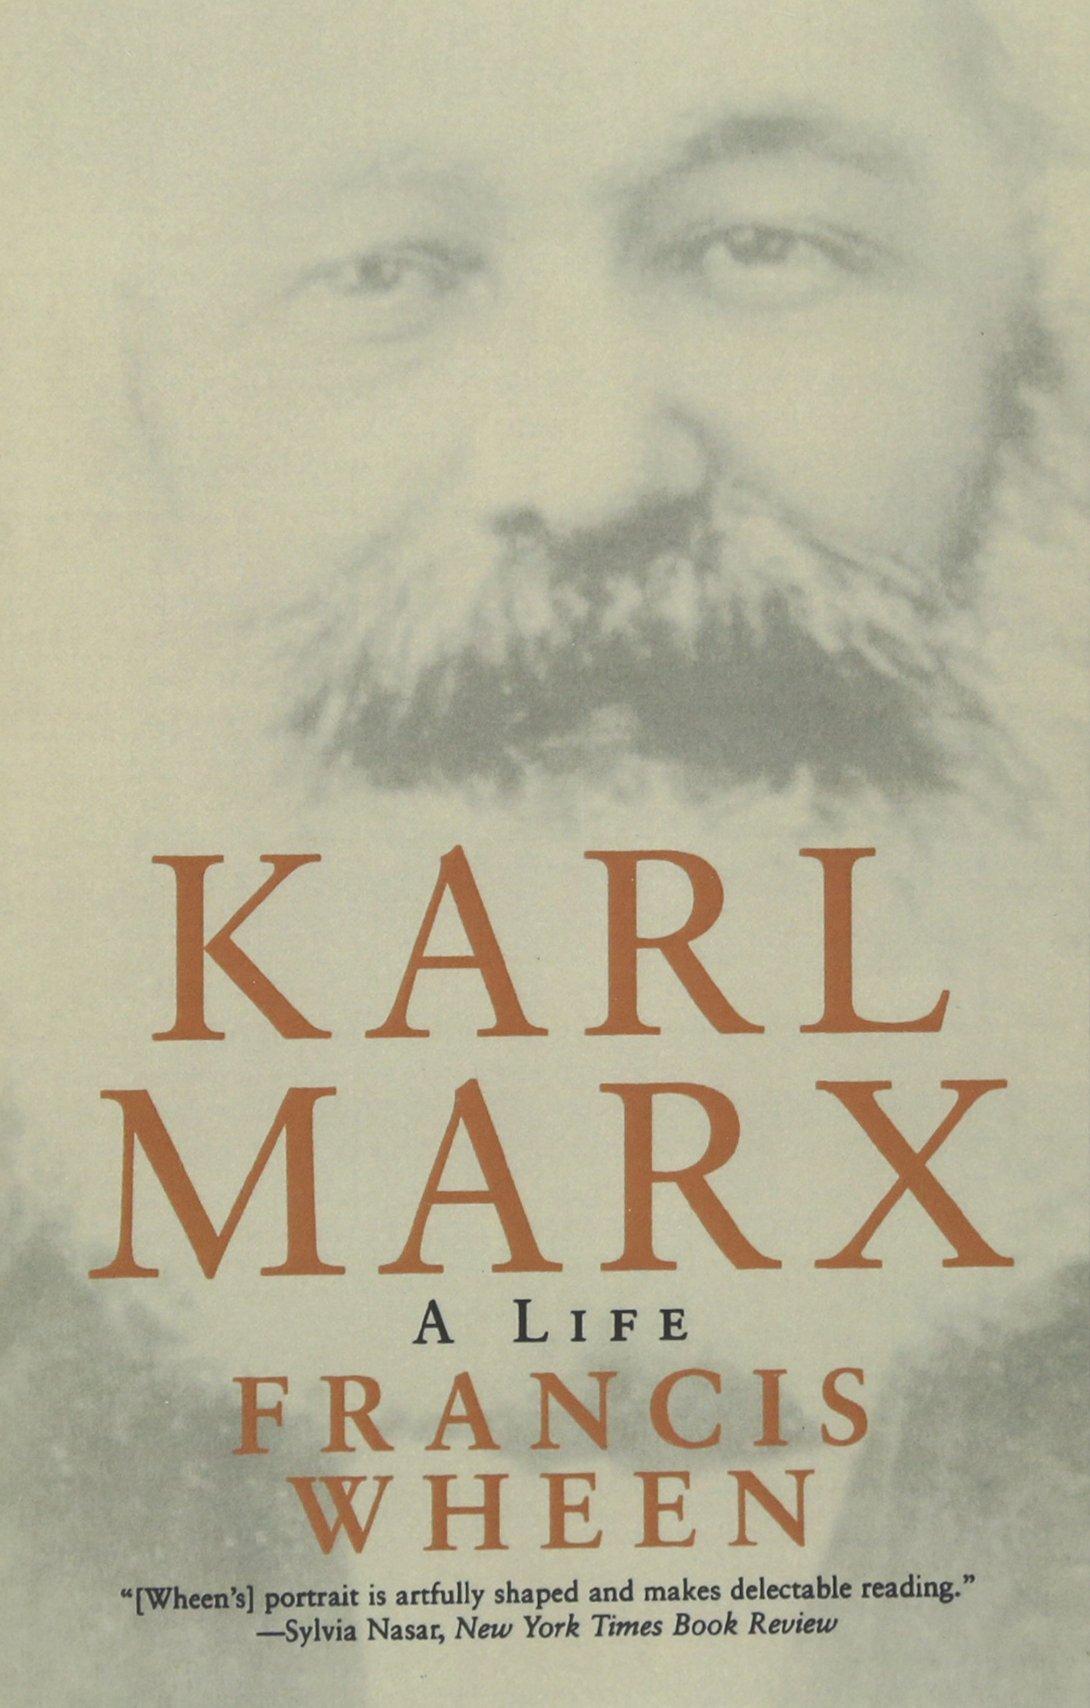 Karl Marx: A Life: Amazon.es: Francis Wheen: Libros en idiomas ...